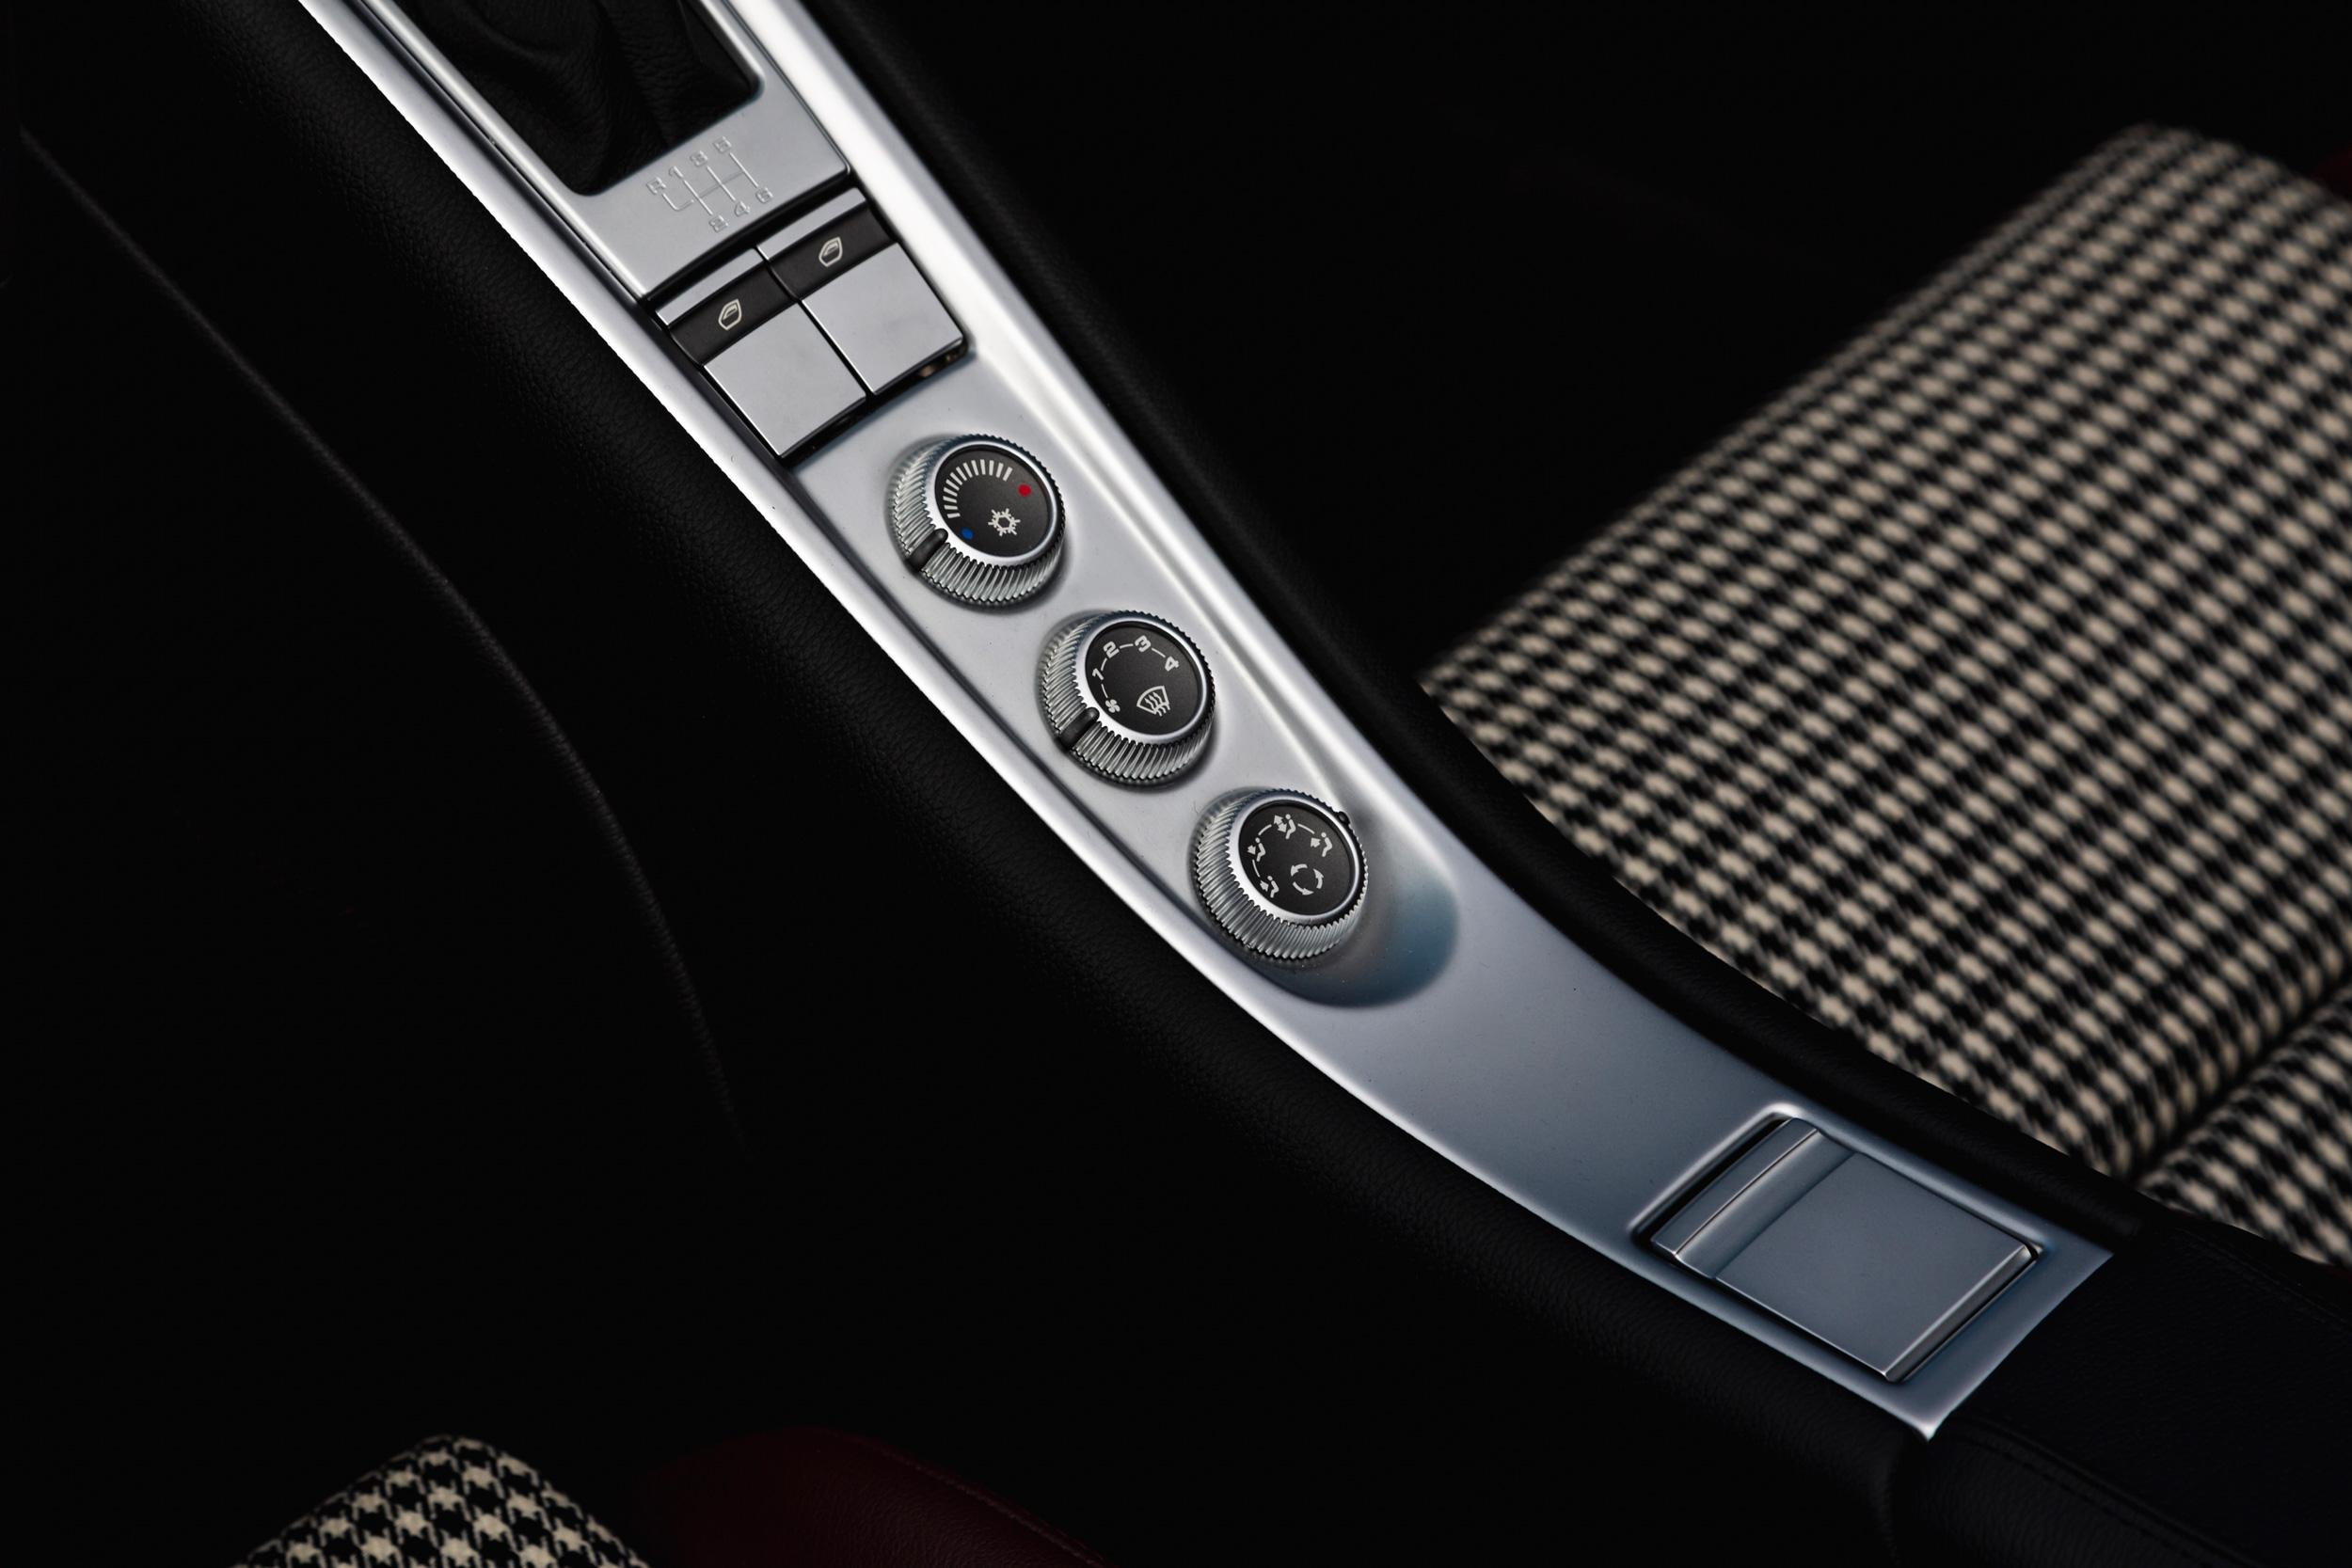 2019 Porsche Carrera GT center knobs